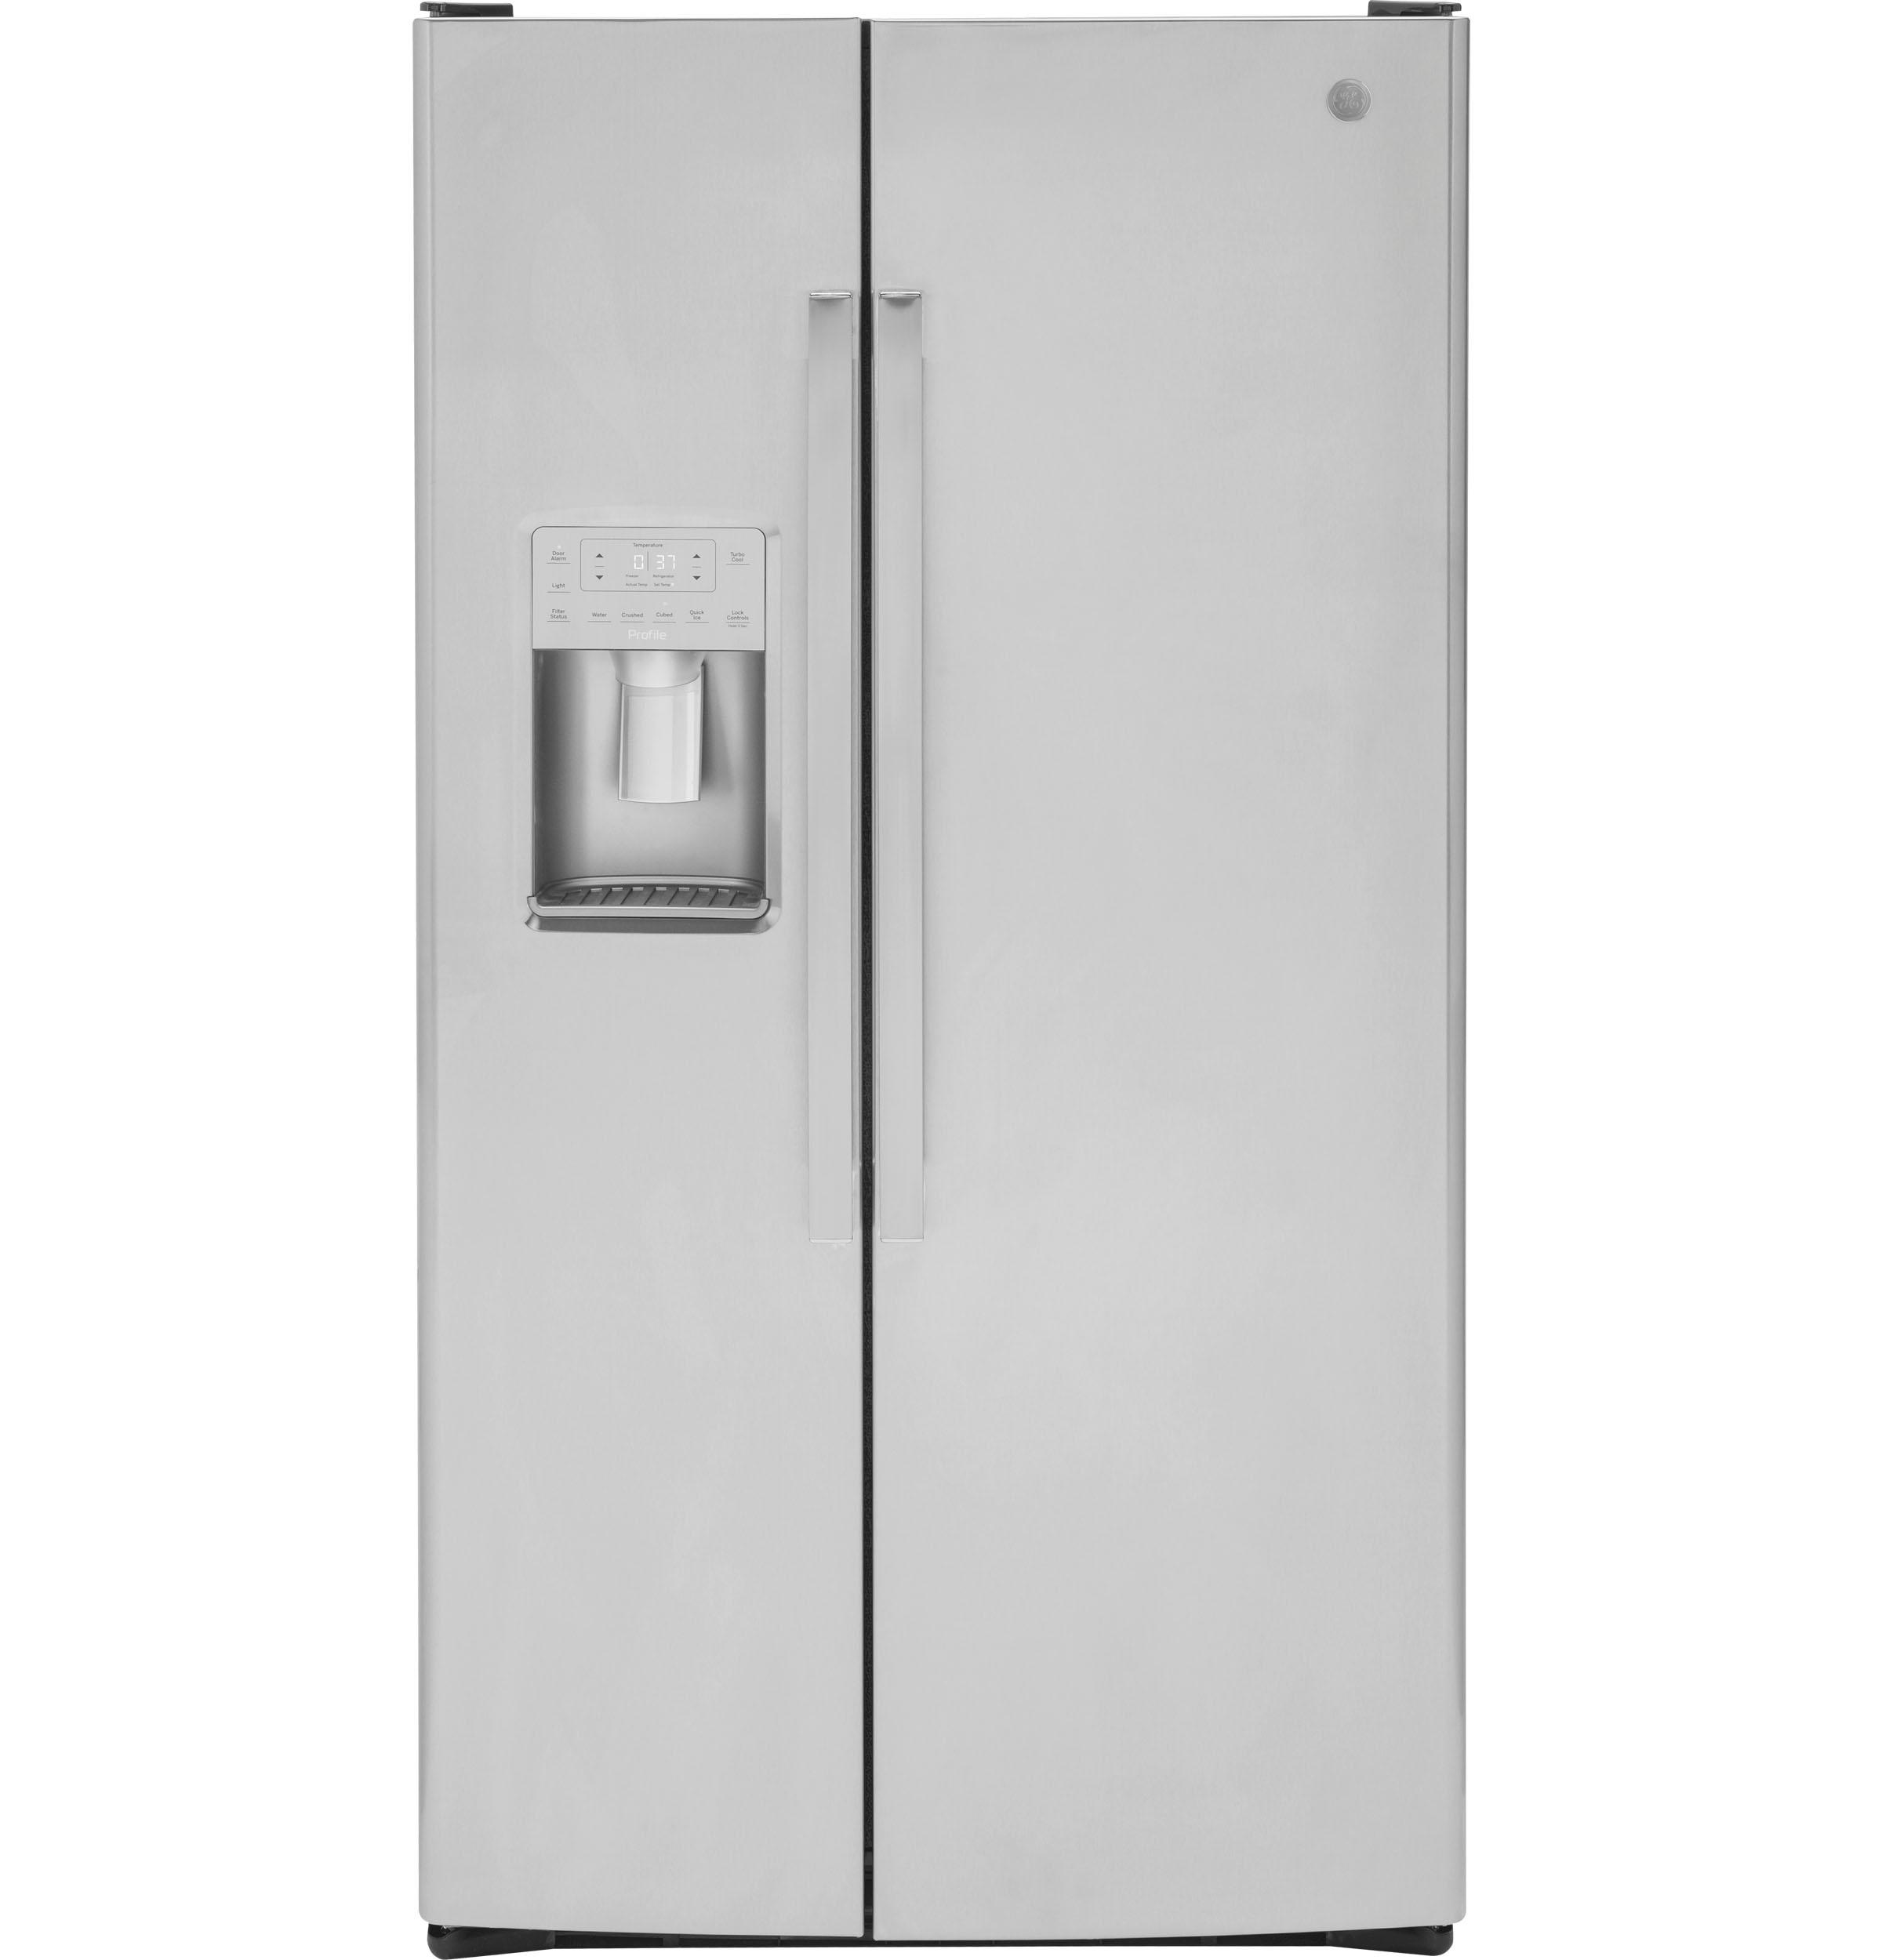 GE Profile GE Profile™ Series 28.2 Cu. Ft. Side-by-Side Refrigerator